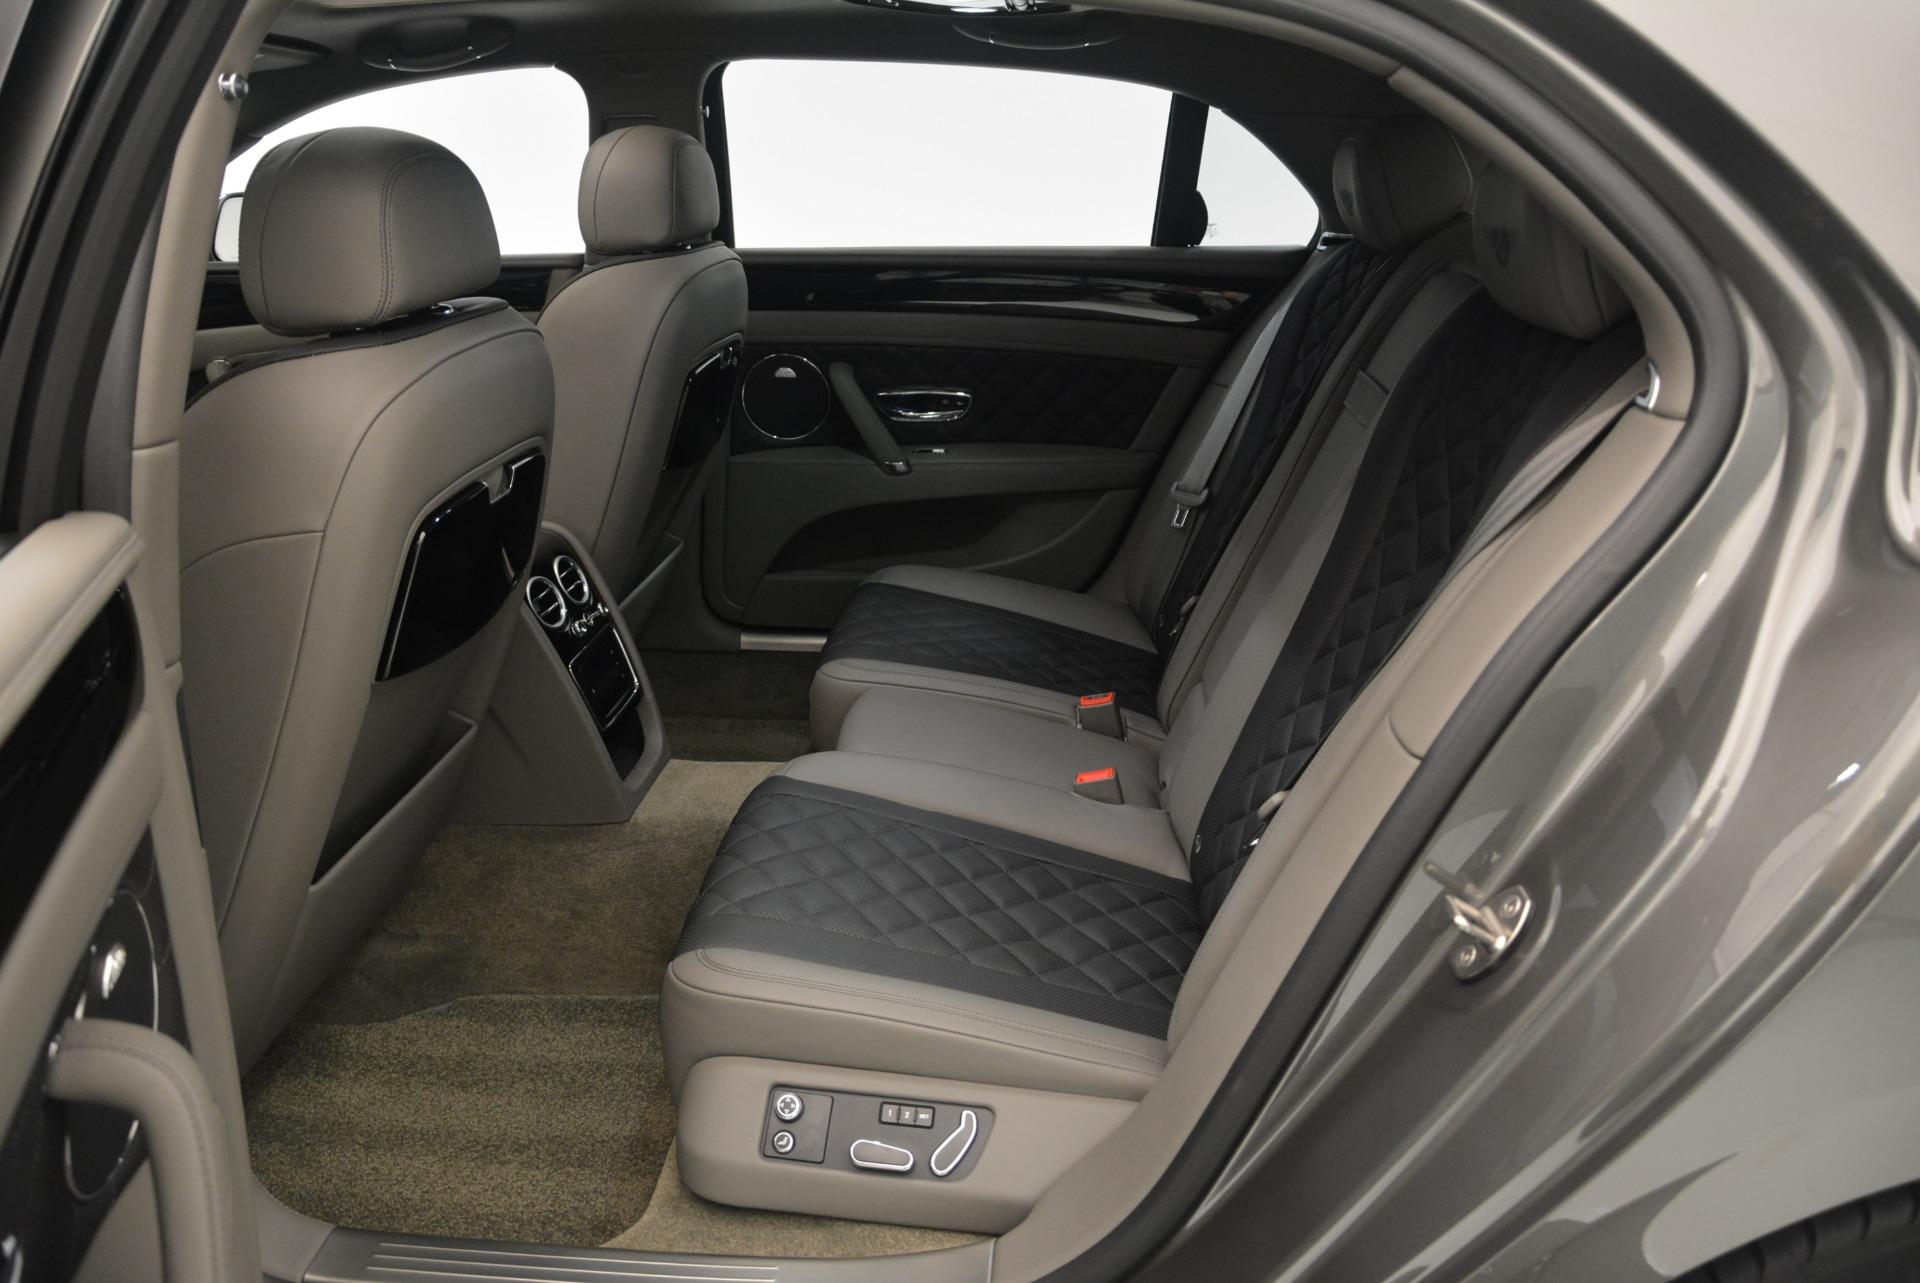 Used 2017 Bentley Flying Spur V8 S For Sale In Westport, CT 2263_p29